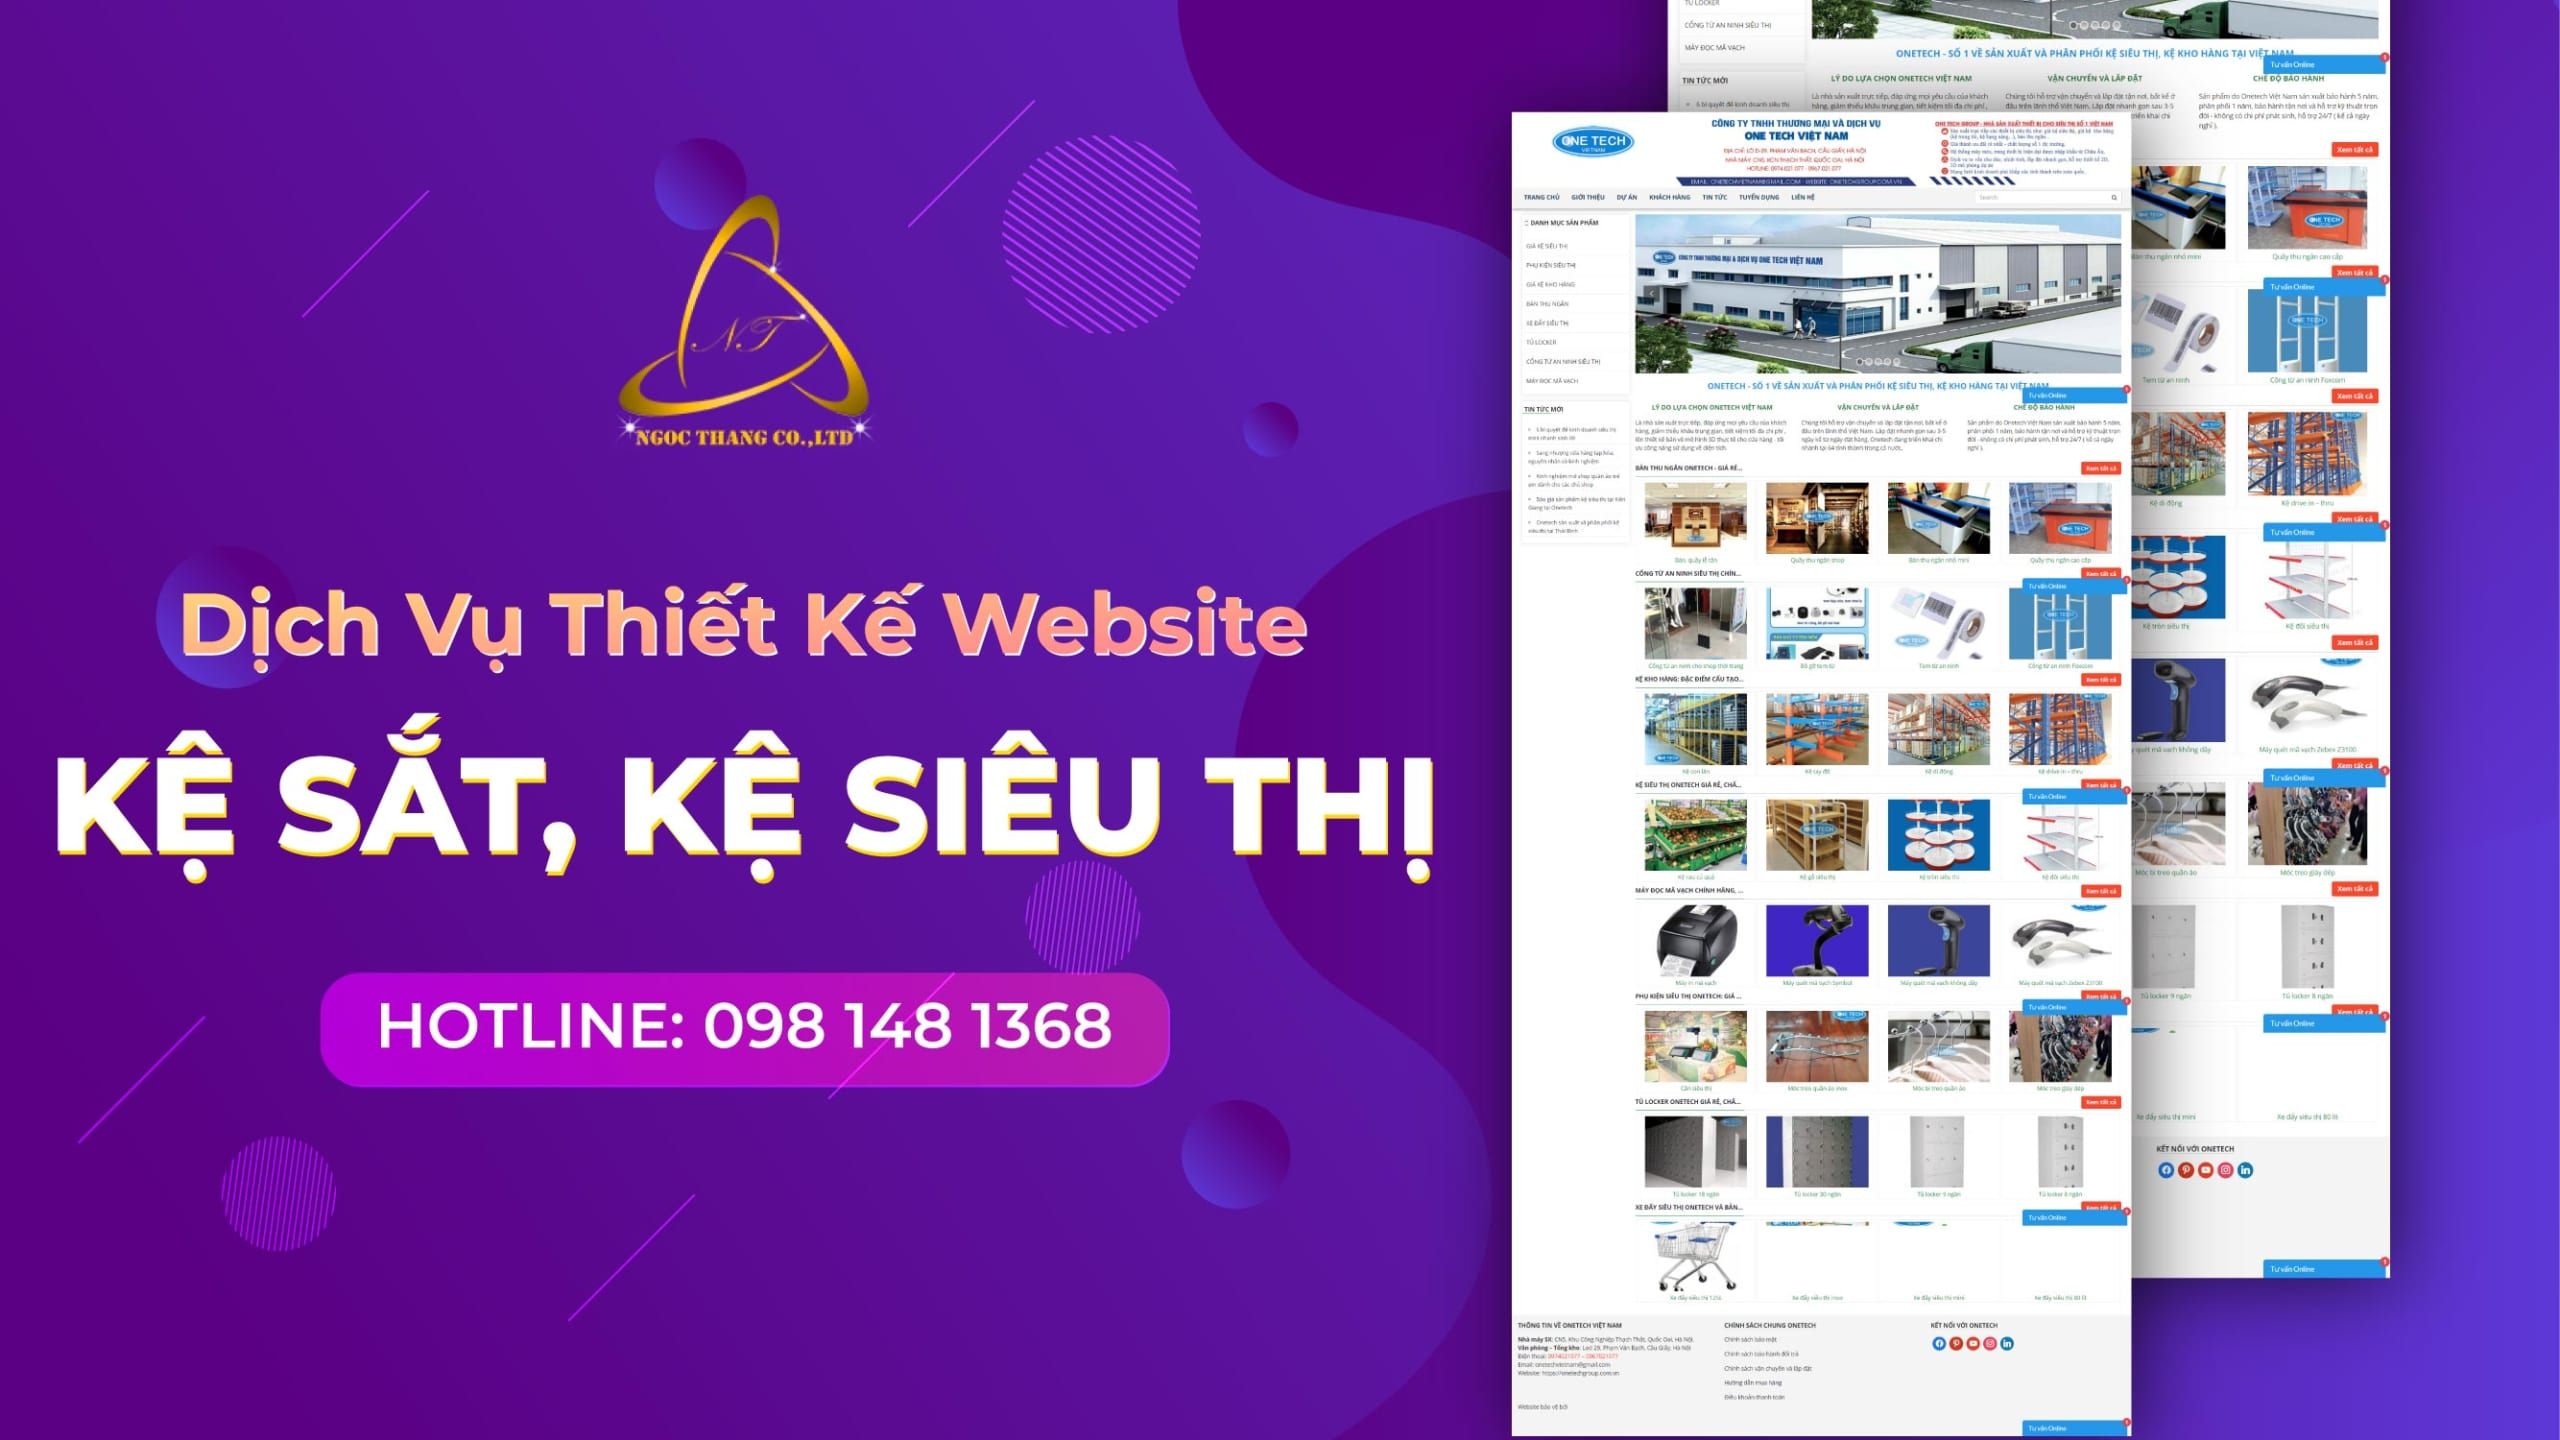 thiết kế website kệ sắt